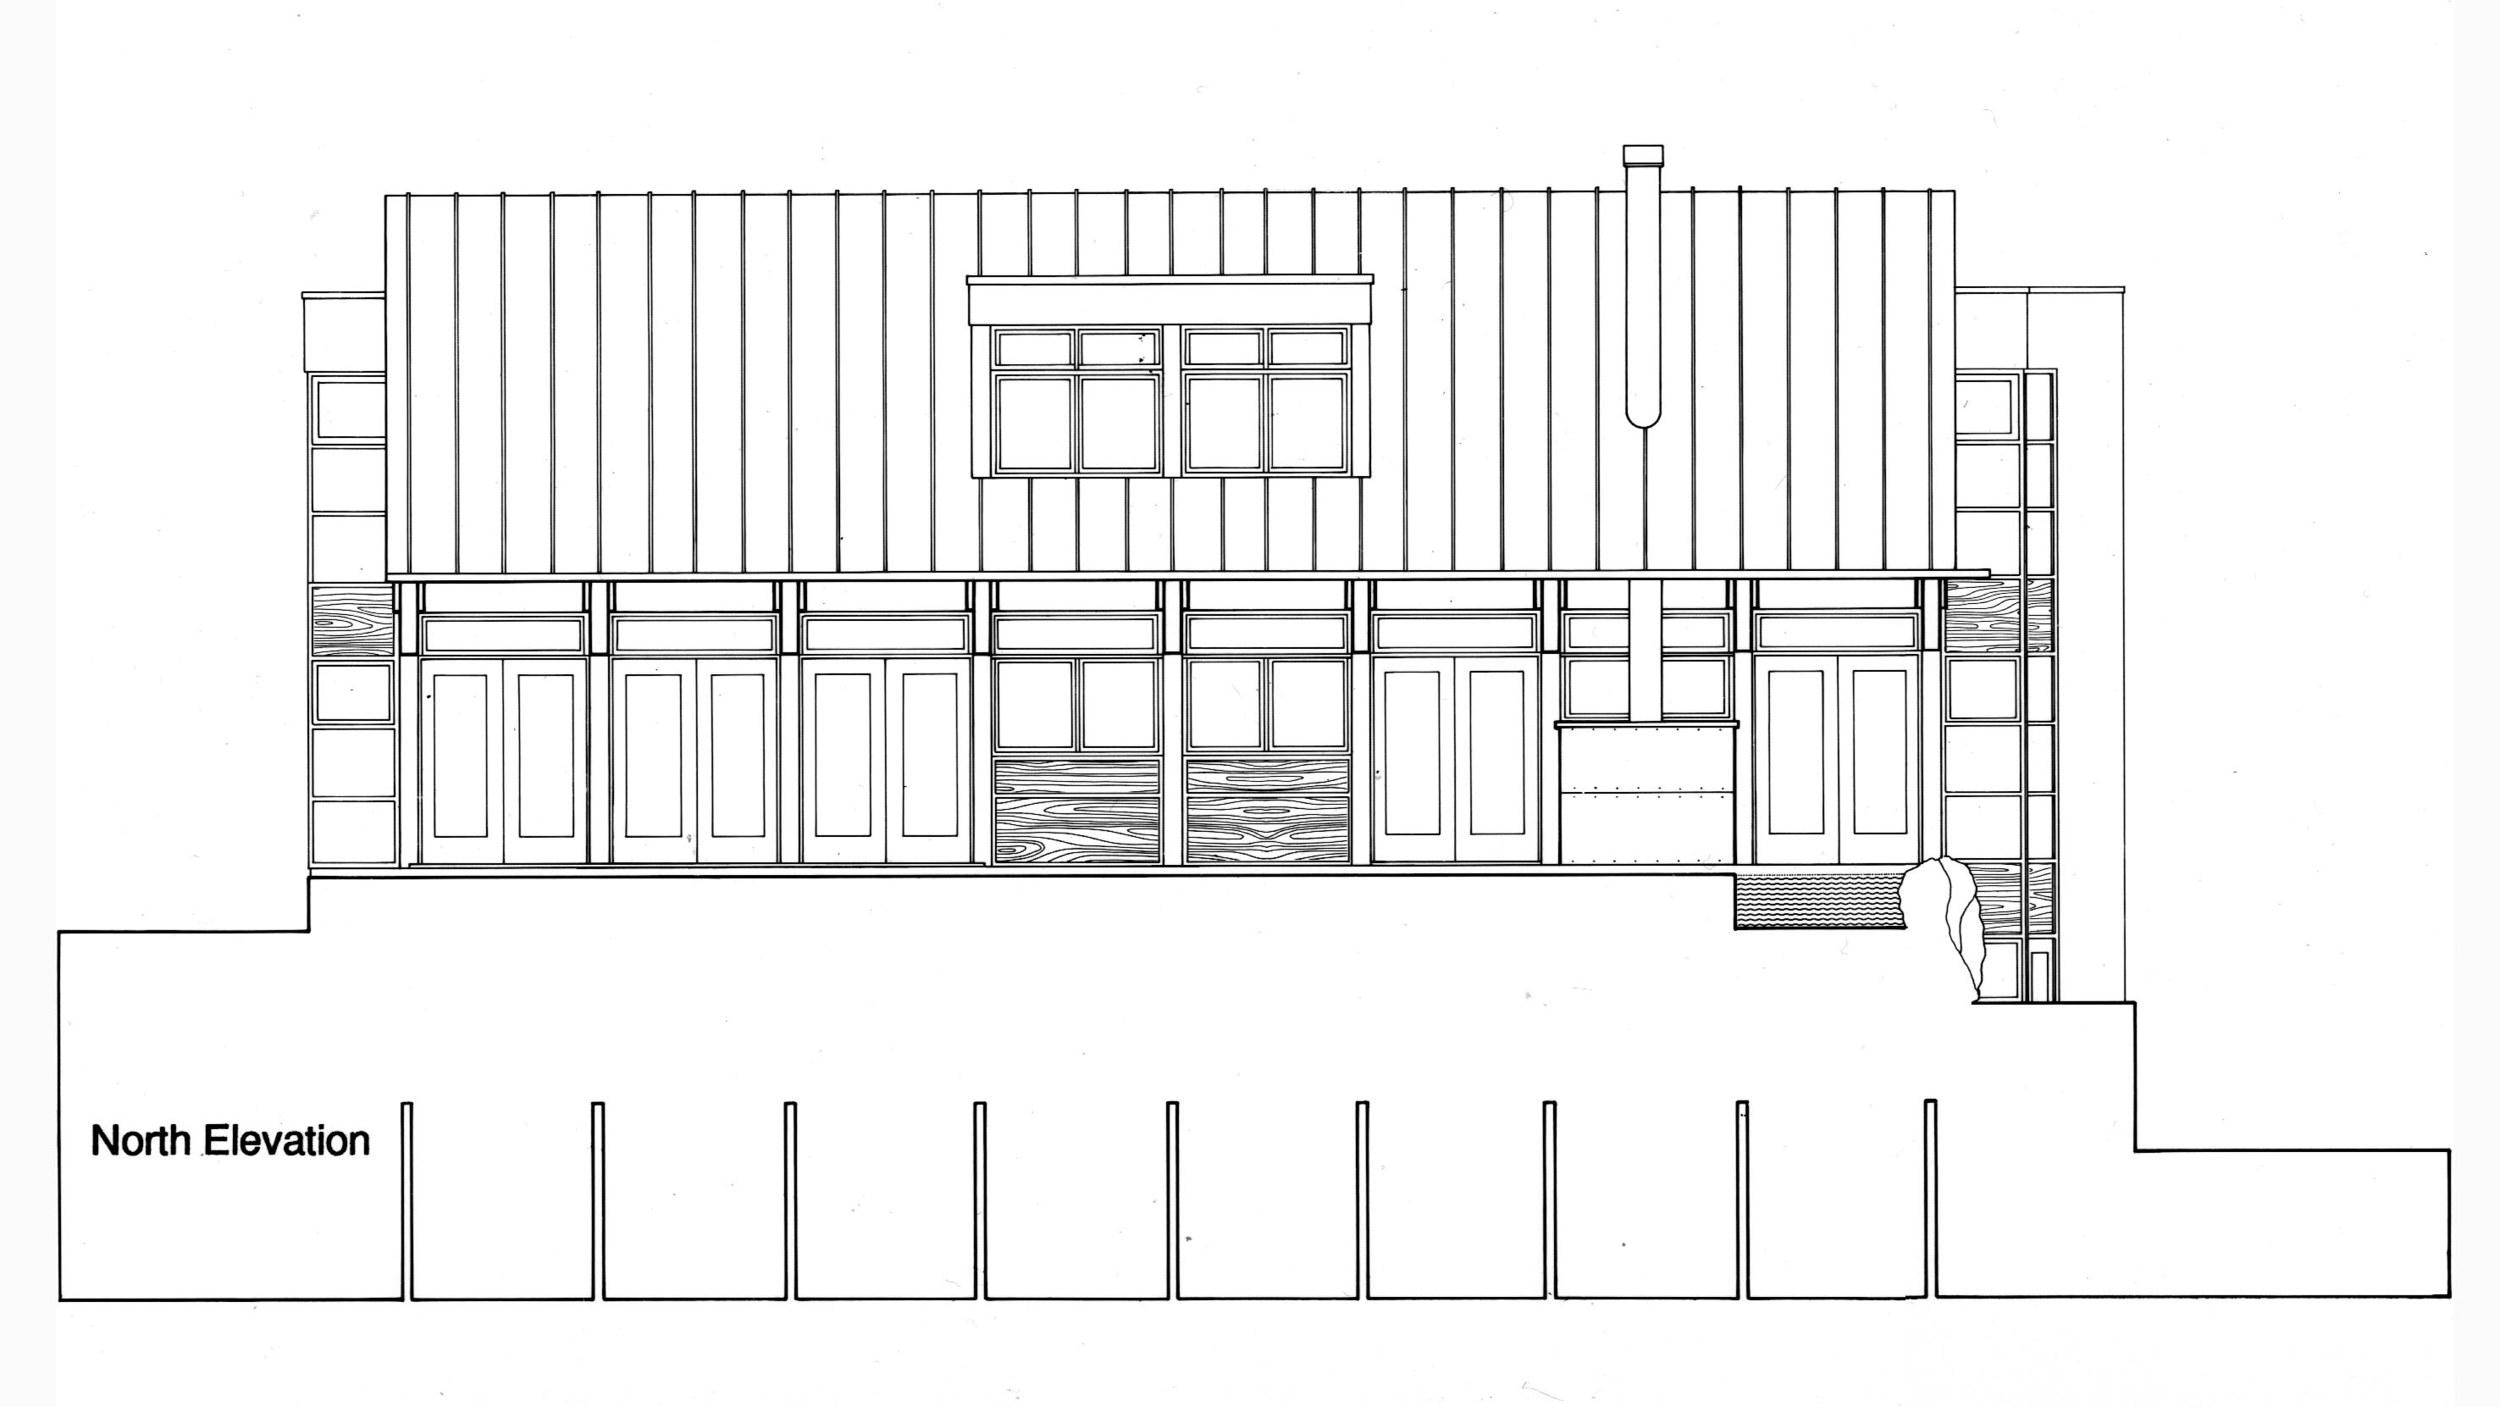 marshall-n.elevation.B.jpg